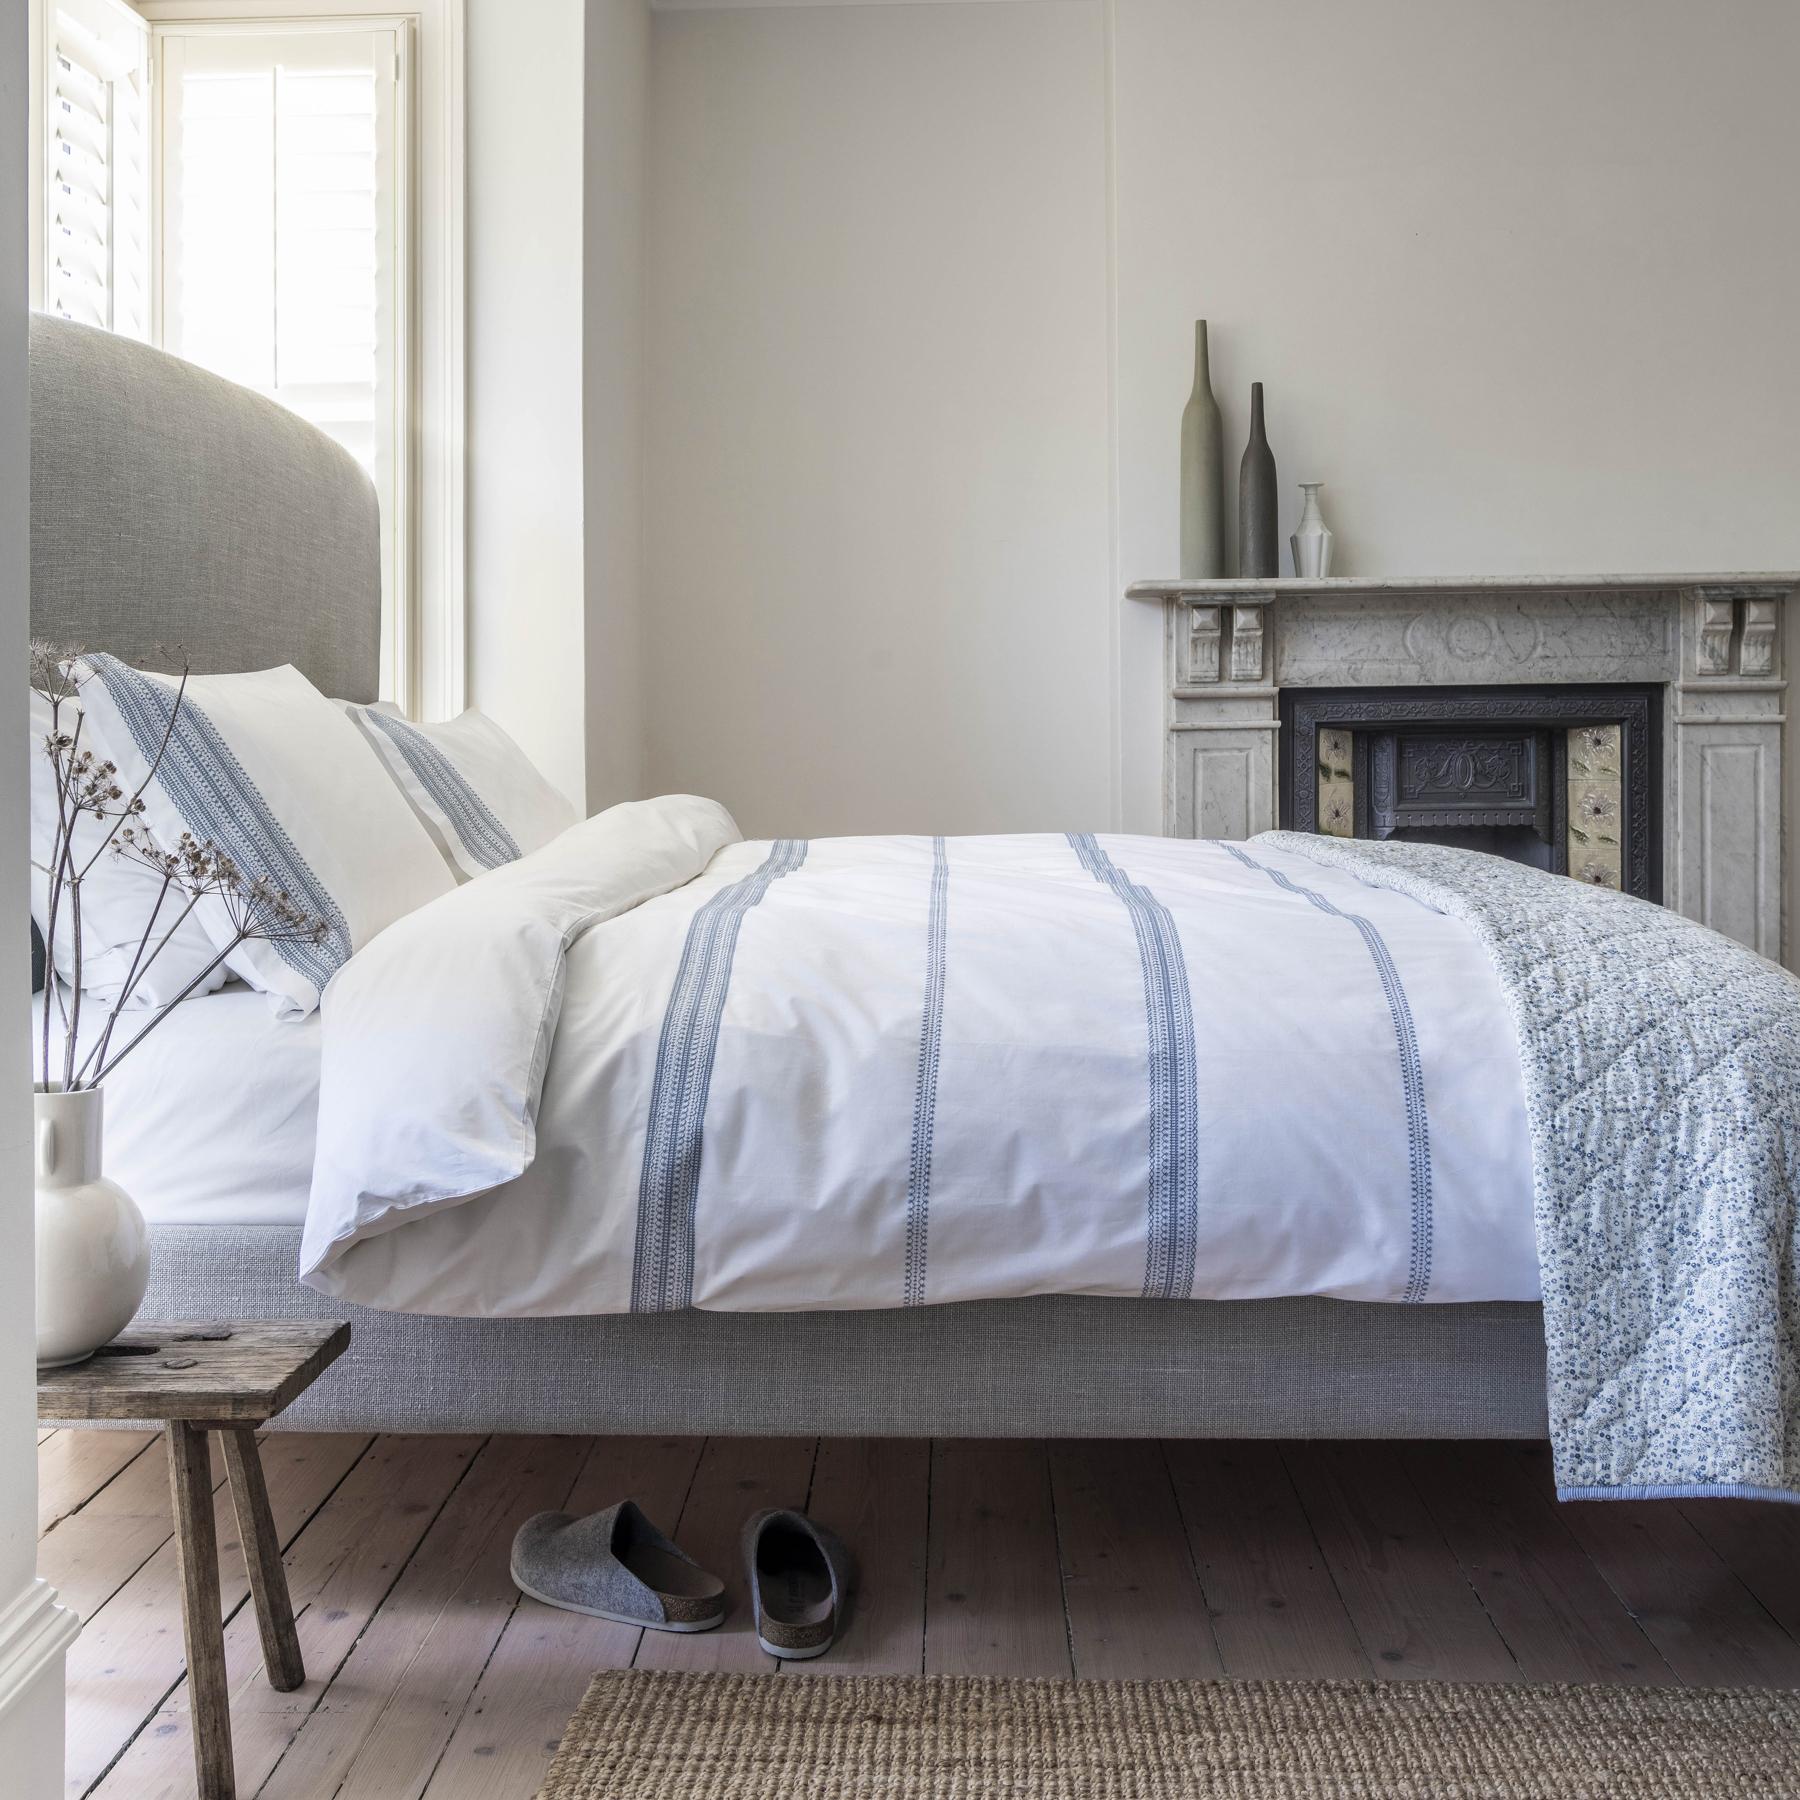 bedding-17